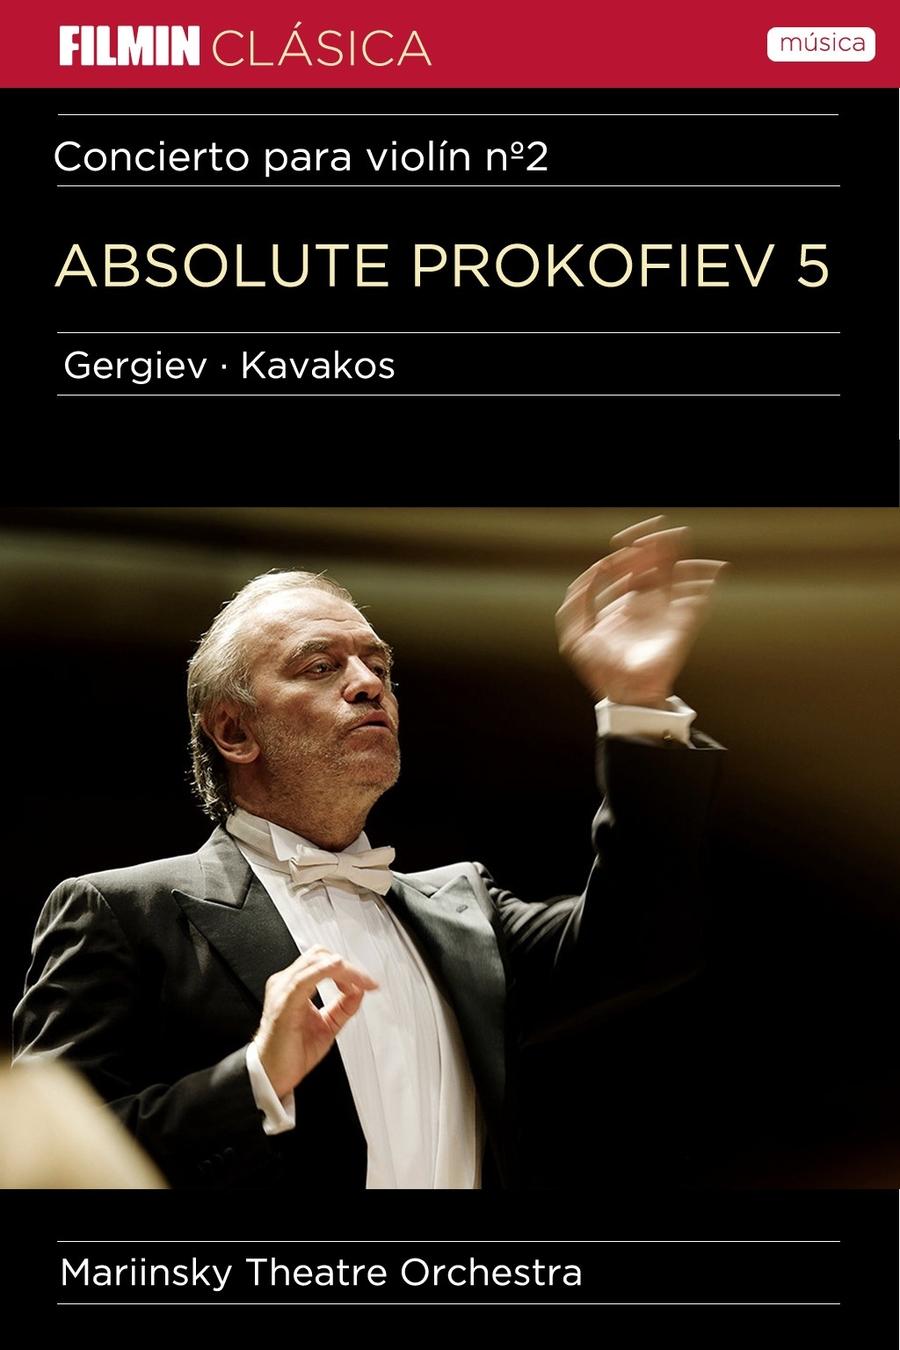 Absolute Prokofiev 5